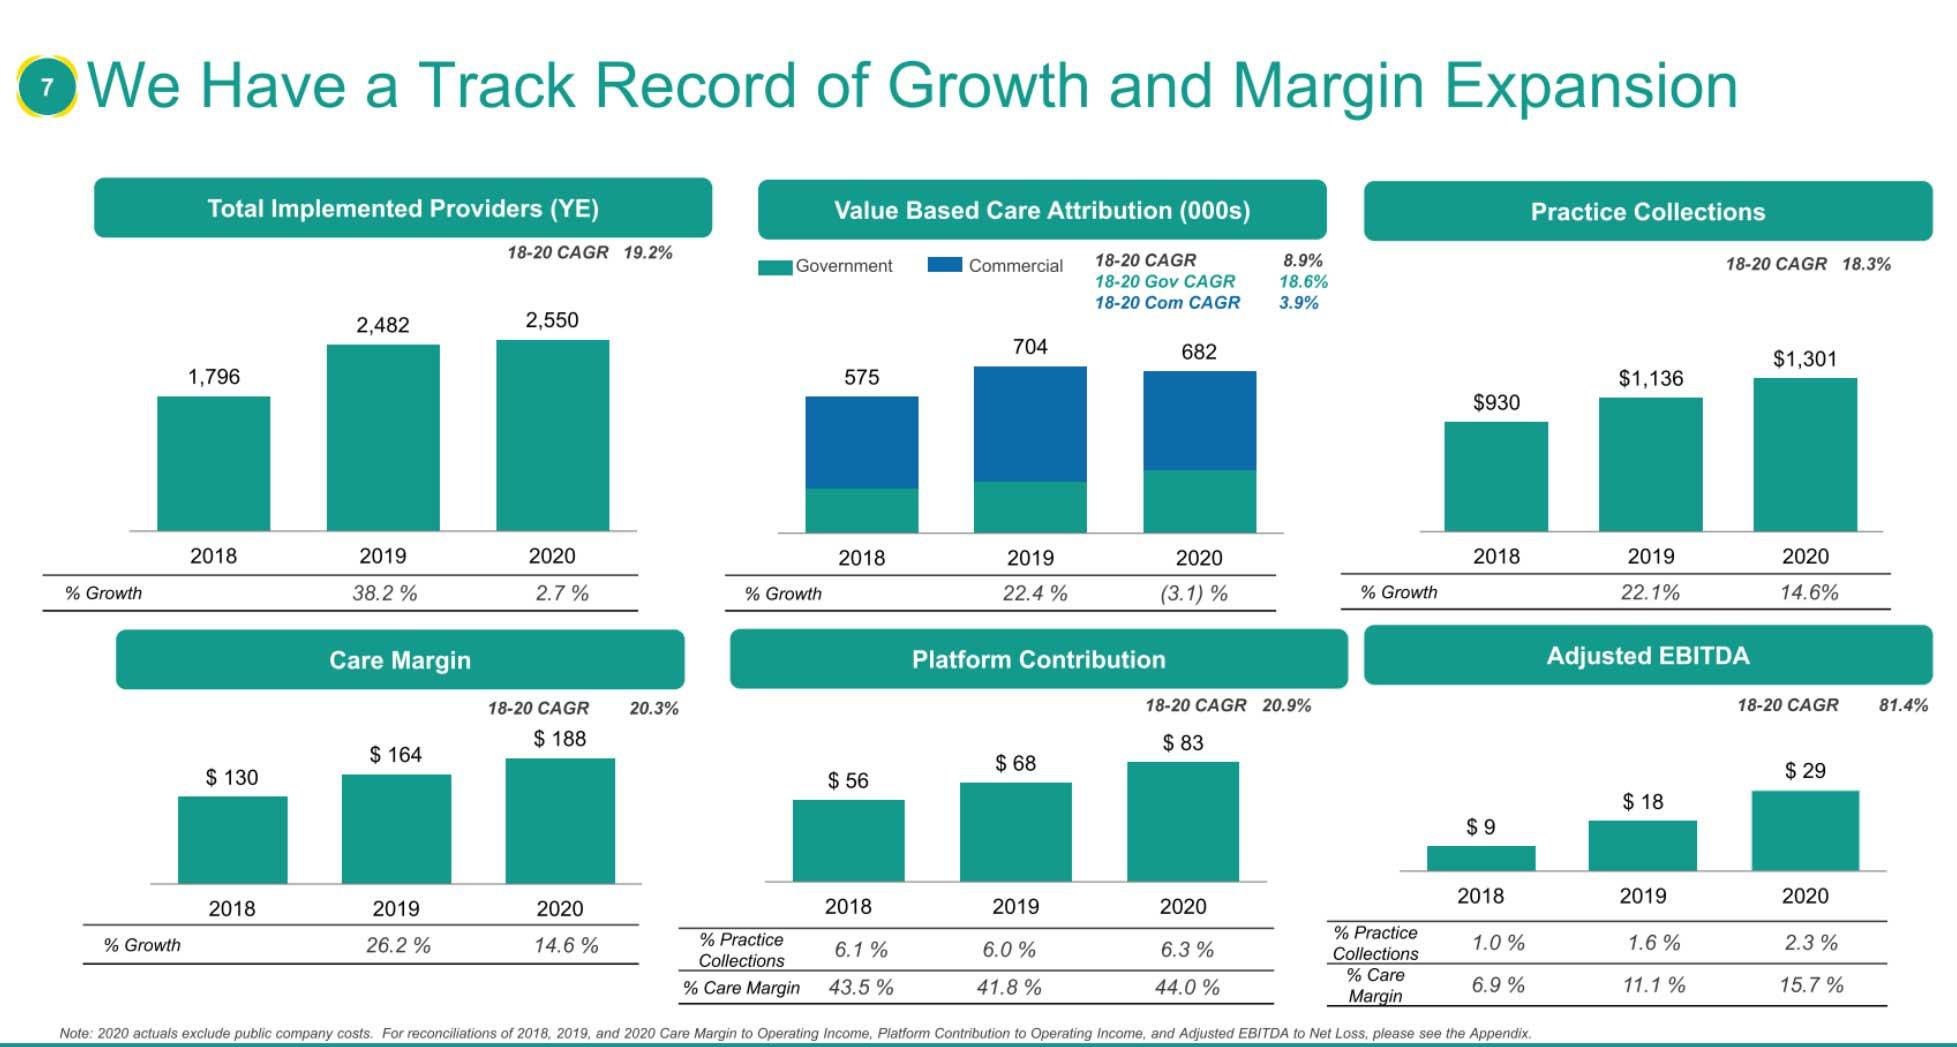 Privia Health拟美股上市:最高募资3.7亿美元 路演PPT曝光